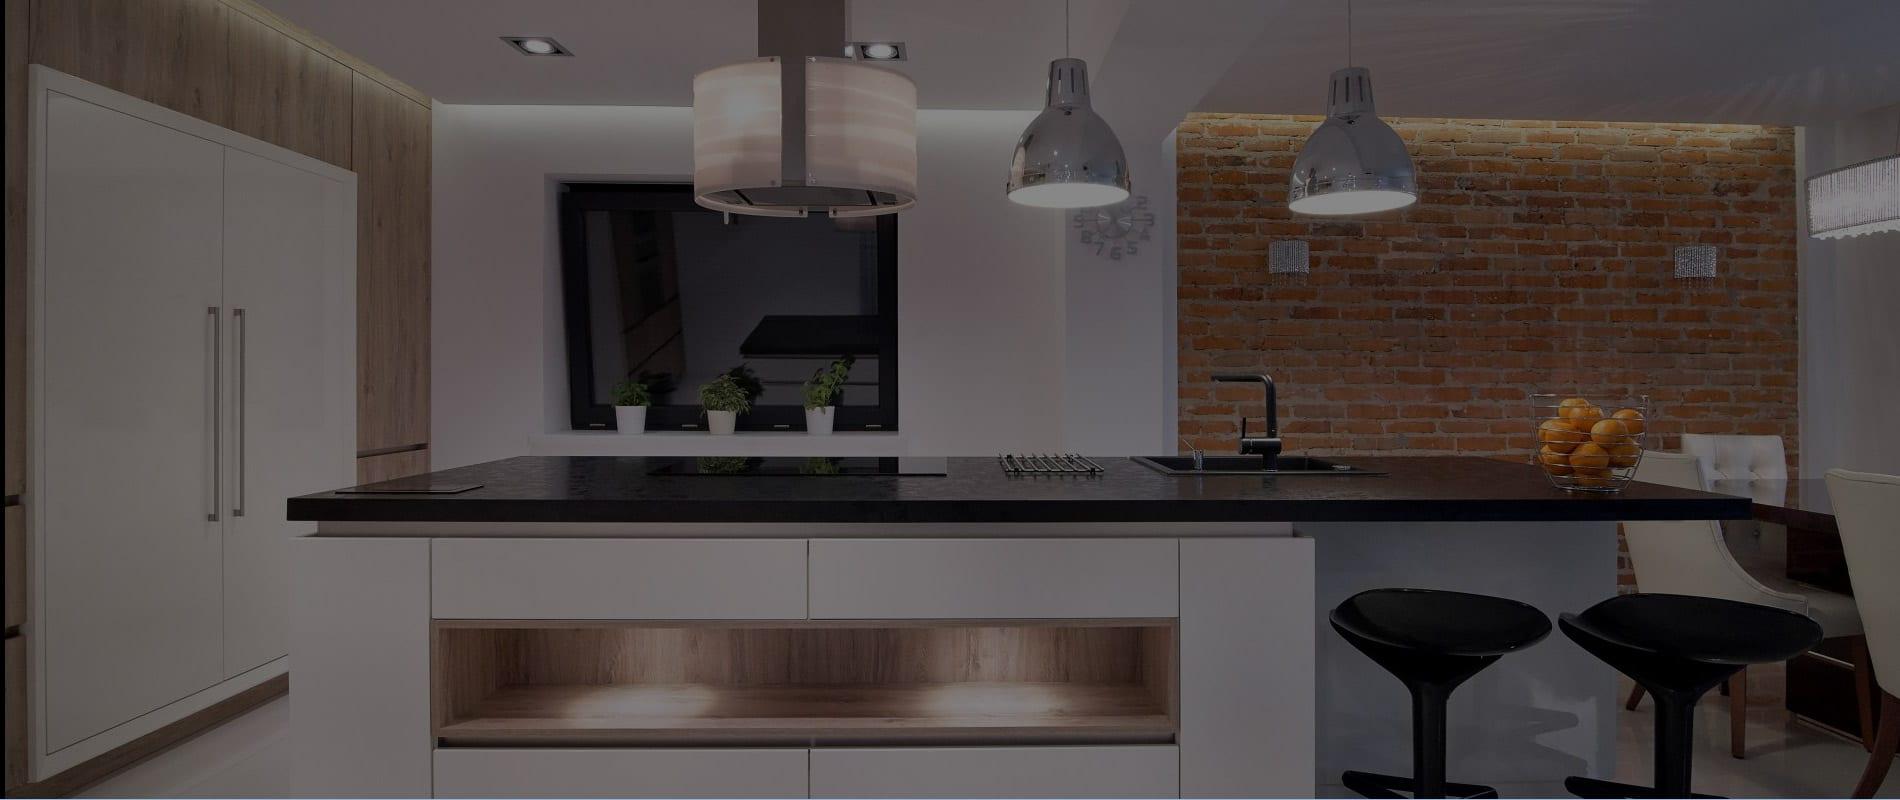 Sleek custom kitchen design with black counter tops, underneath counter lighting